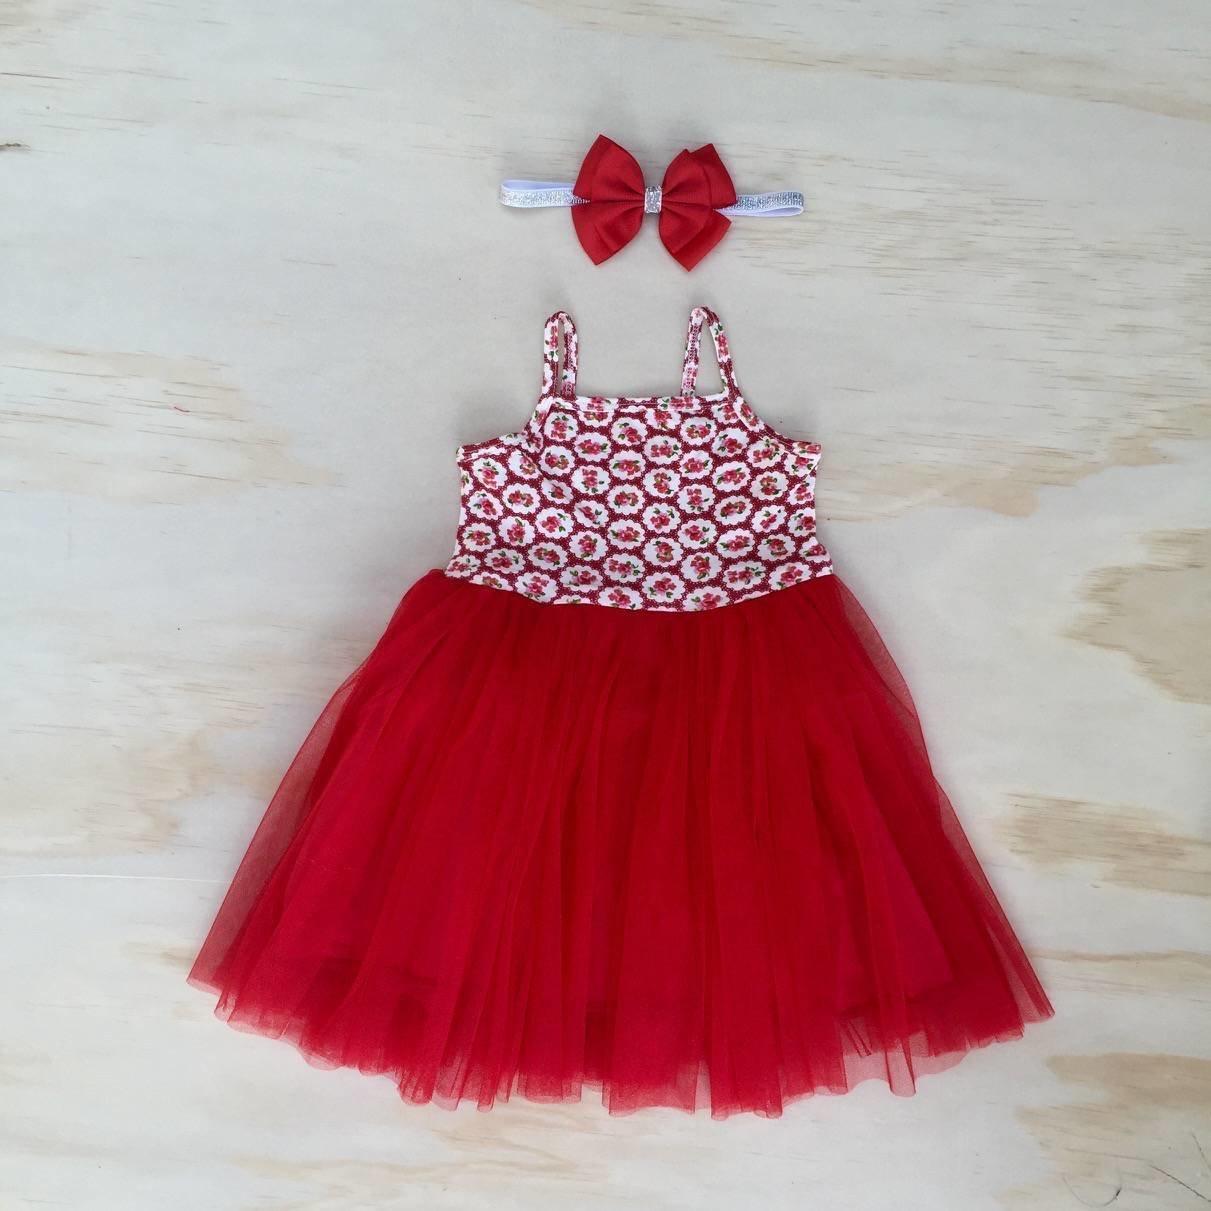 Gabrielle Dress - Size 1 Only